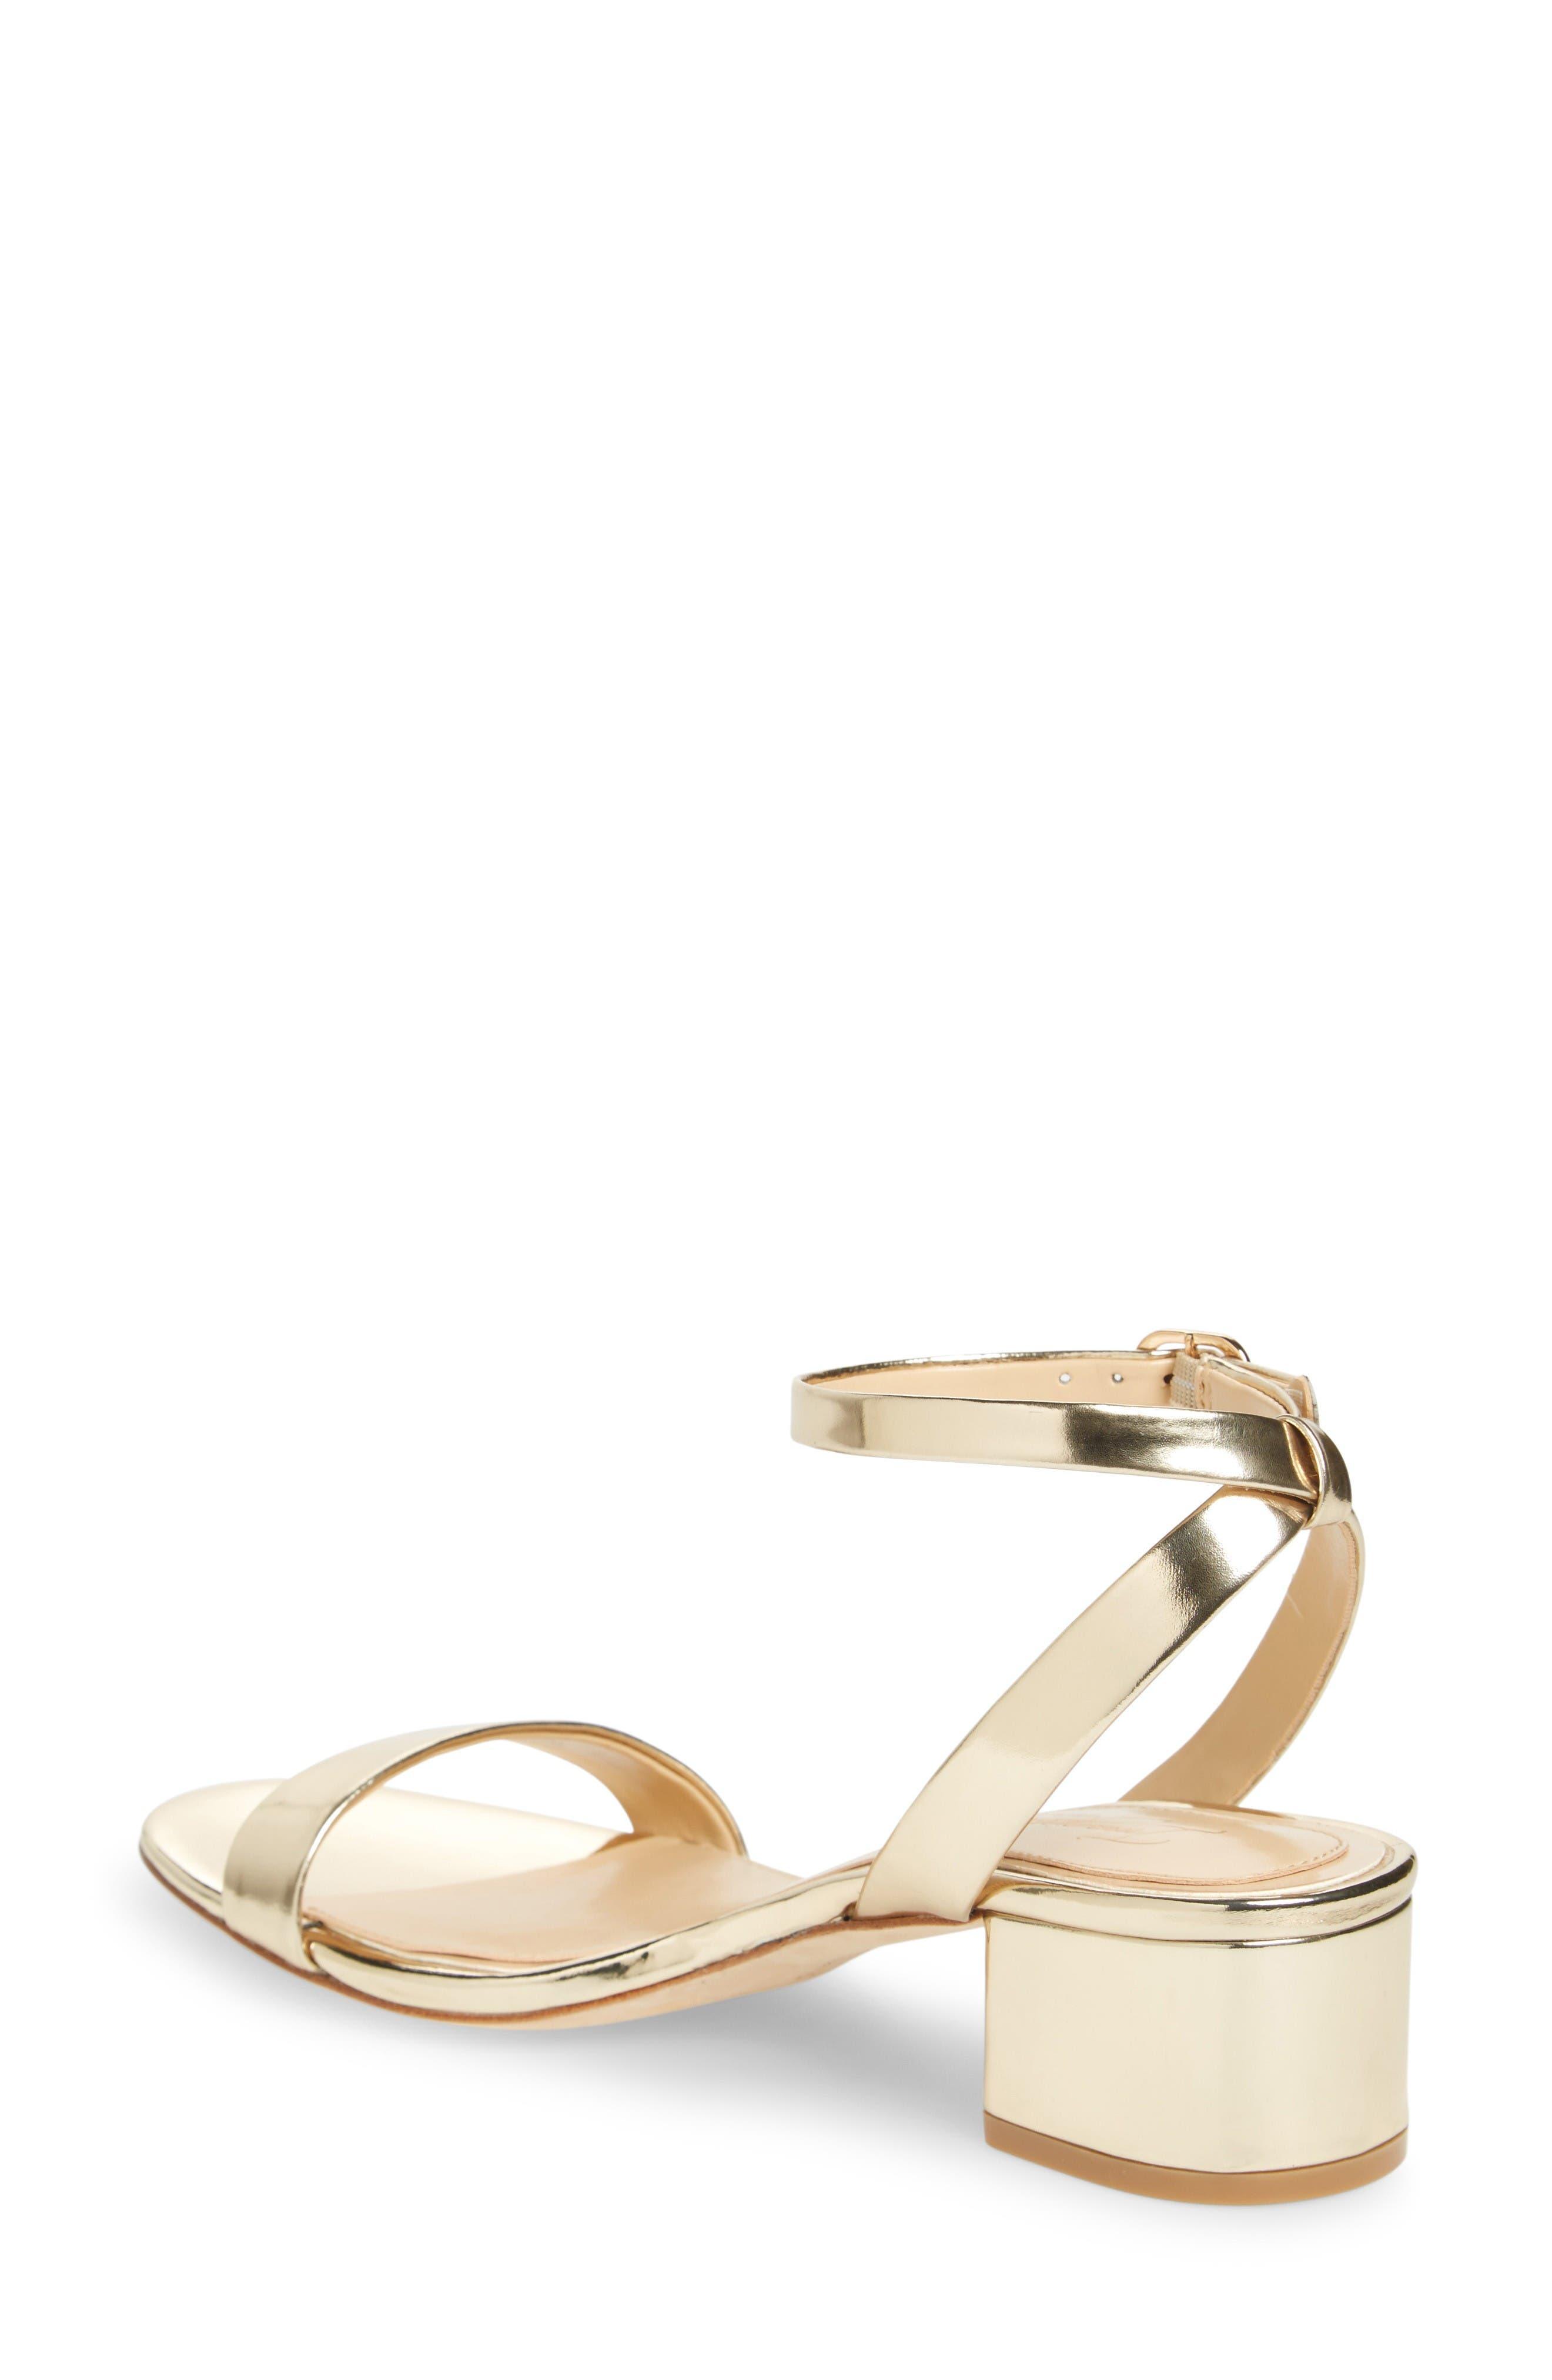 Imagine Vince Camuto Bavel Sandal,                             Alternate thumbnail 2, color,                             Soft Gold Leather